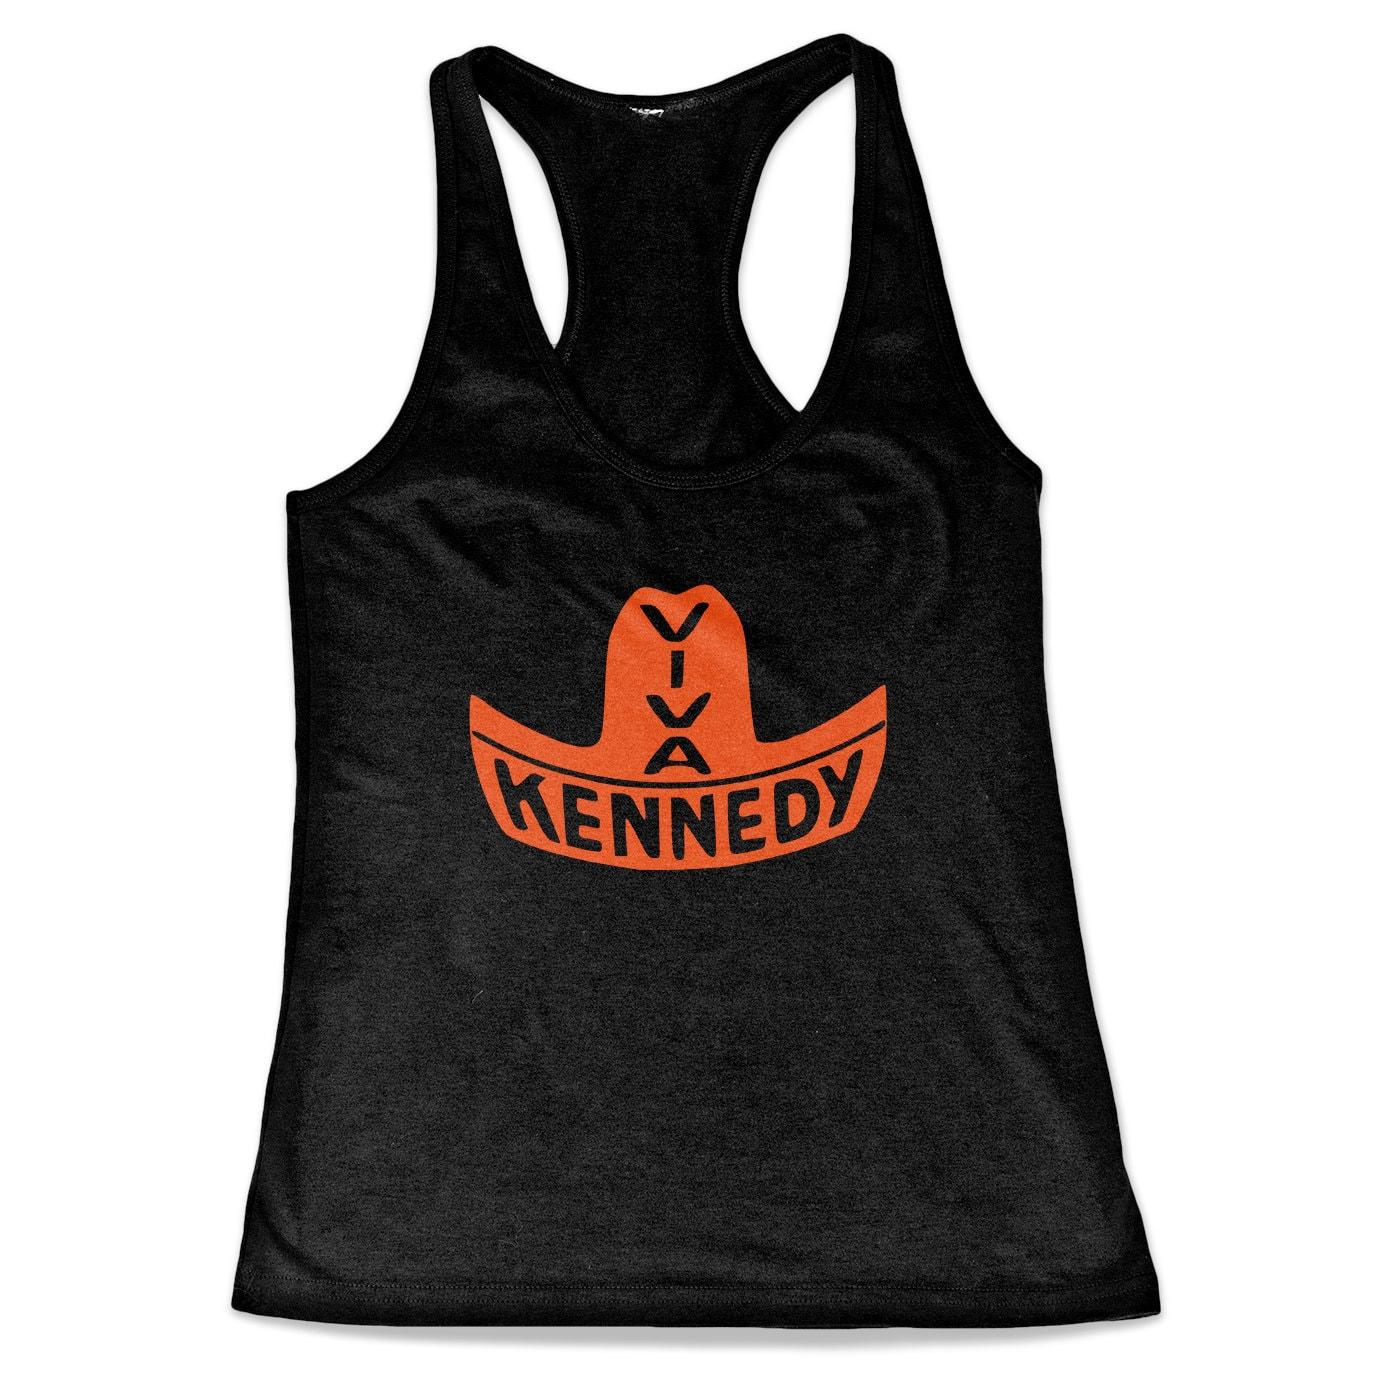 Viva Kennedy - John F. Kennedy Political Campaign Button Tri-Blend Racerback Tank Top